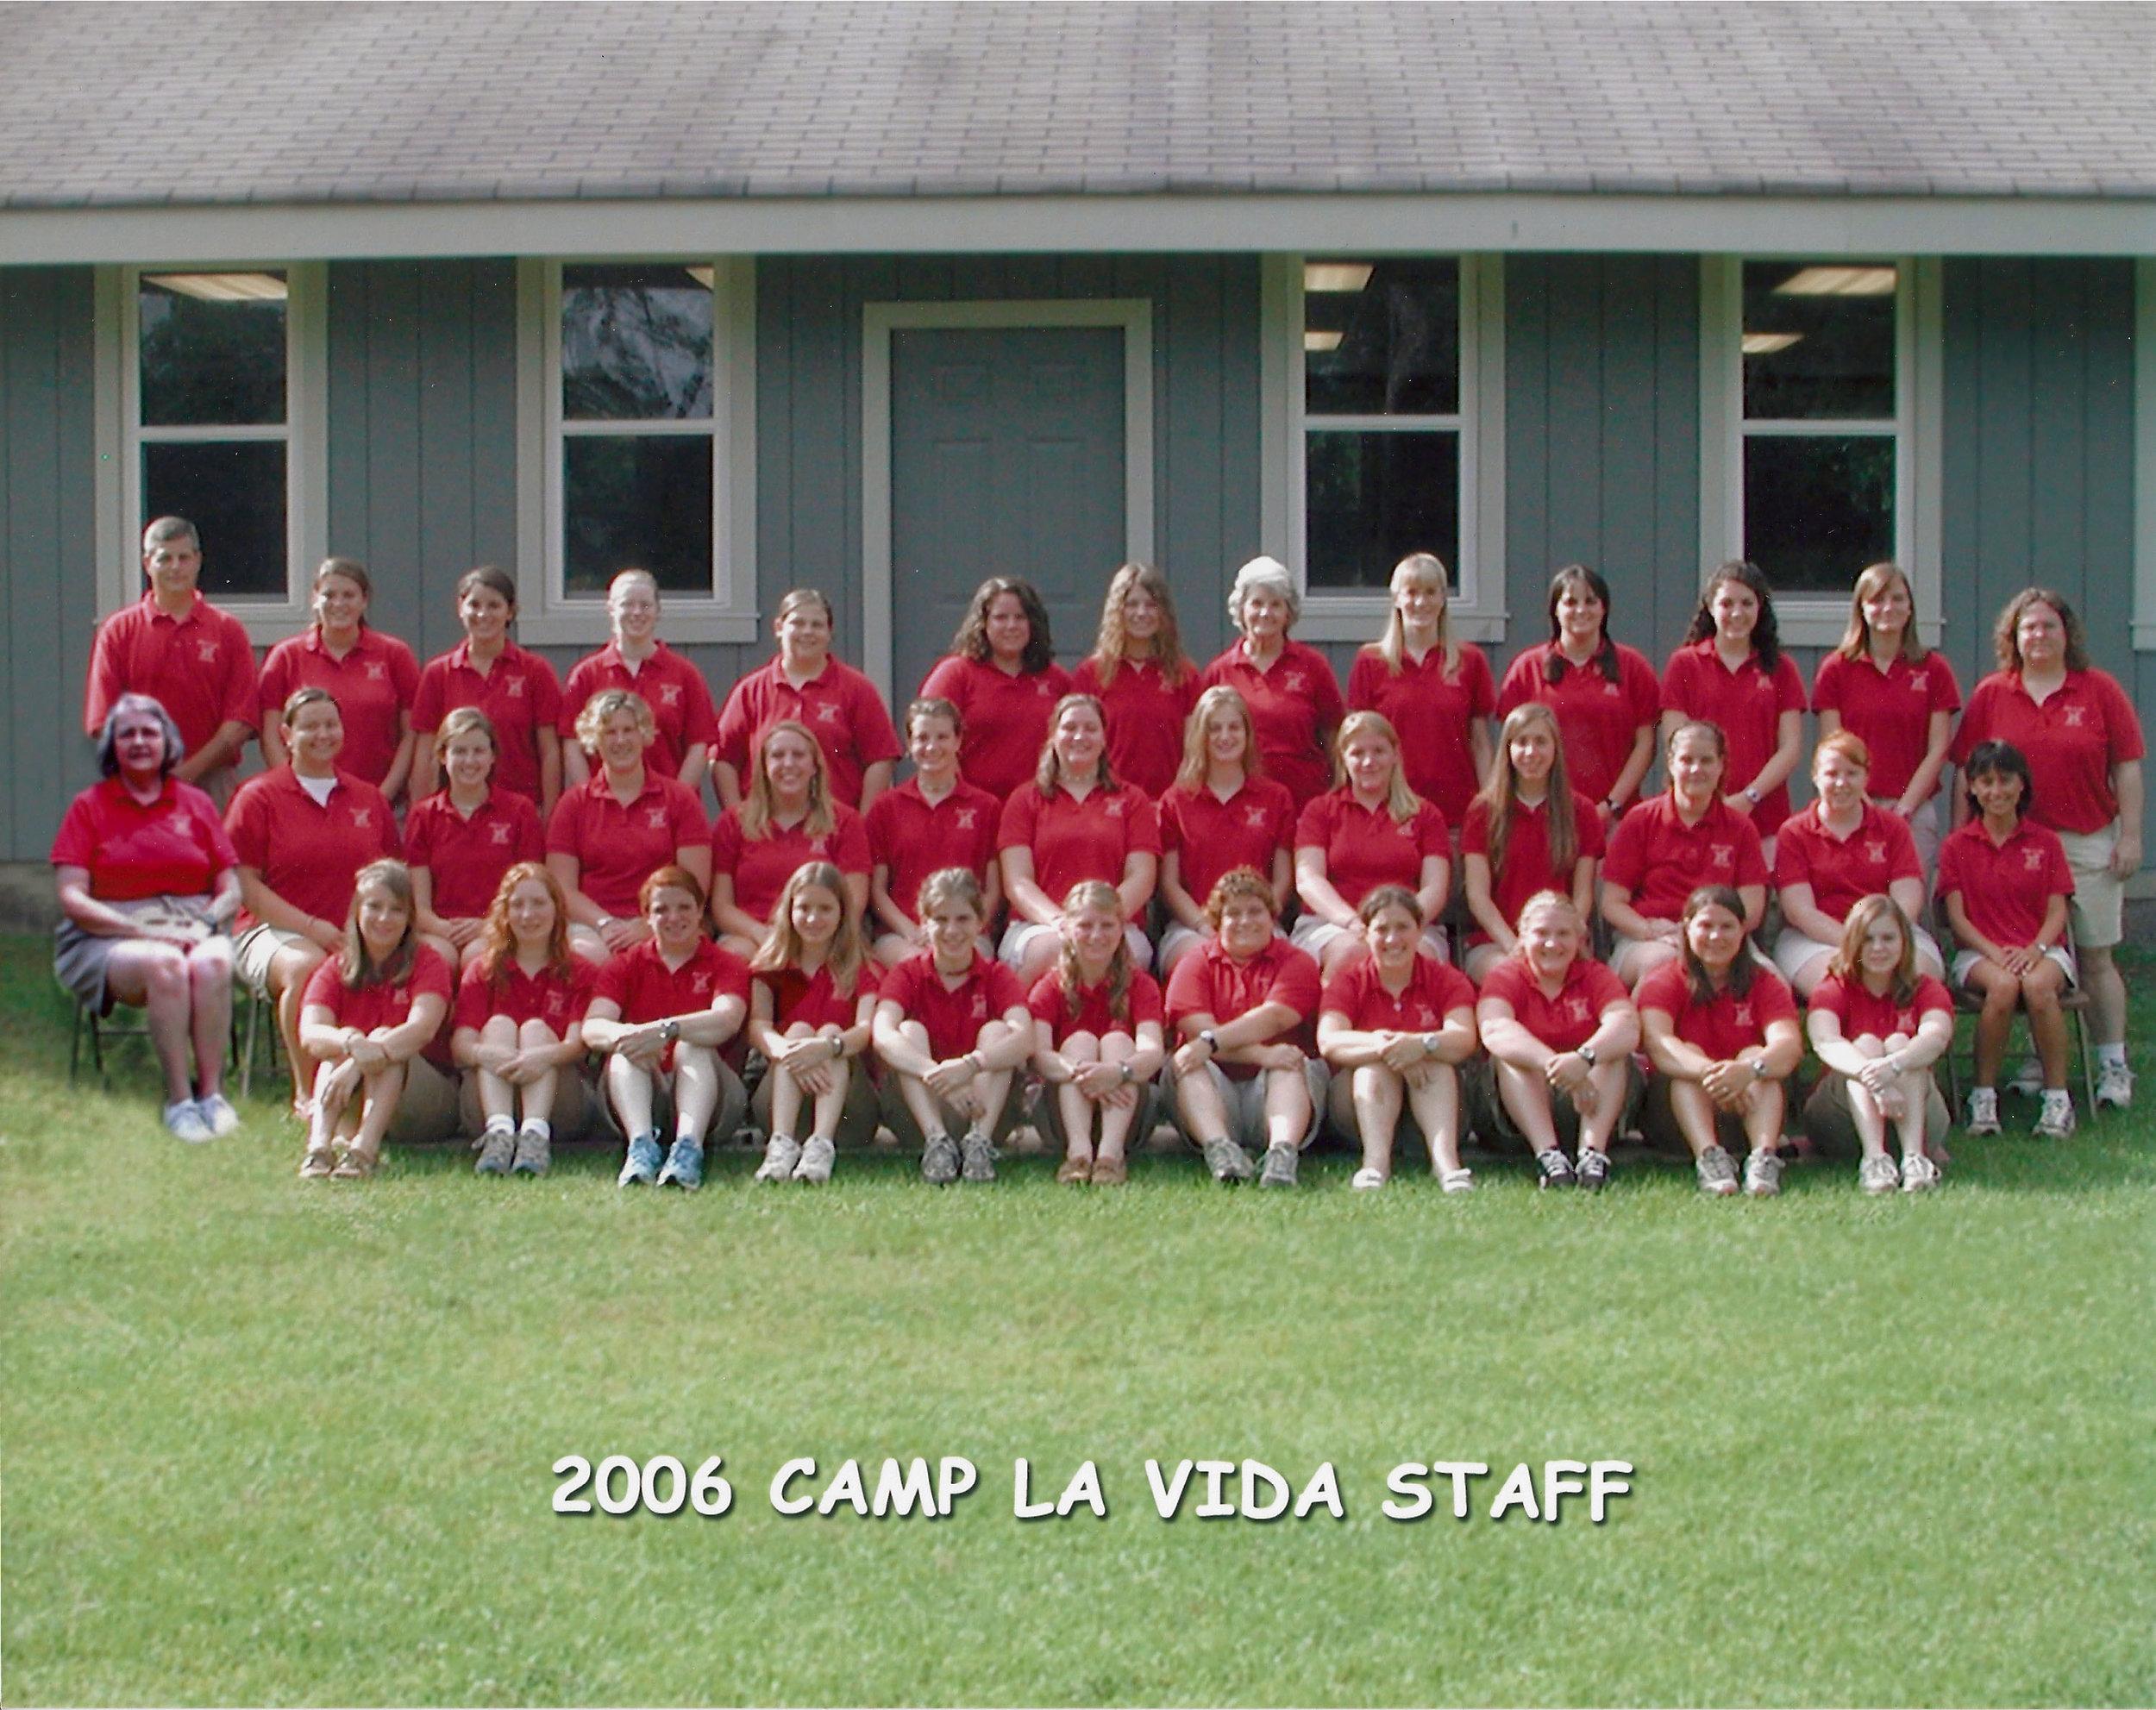 CLV staff 2006.jpg